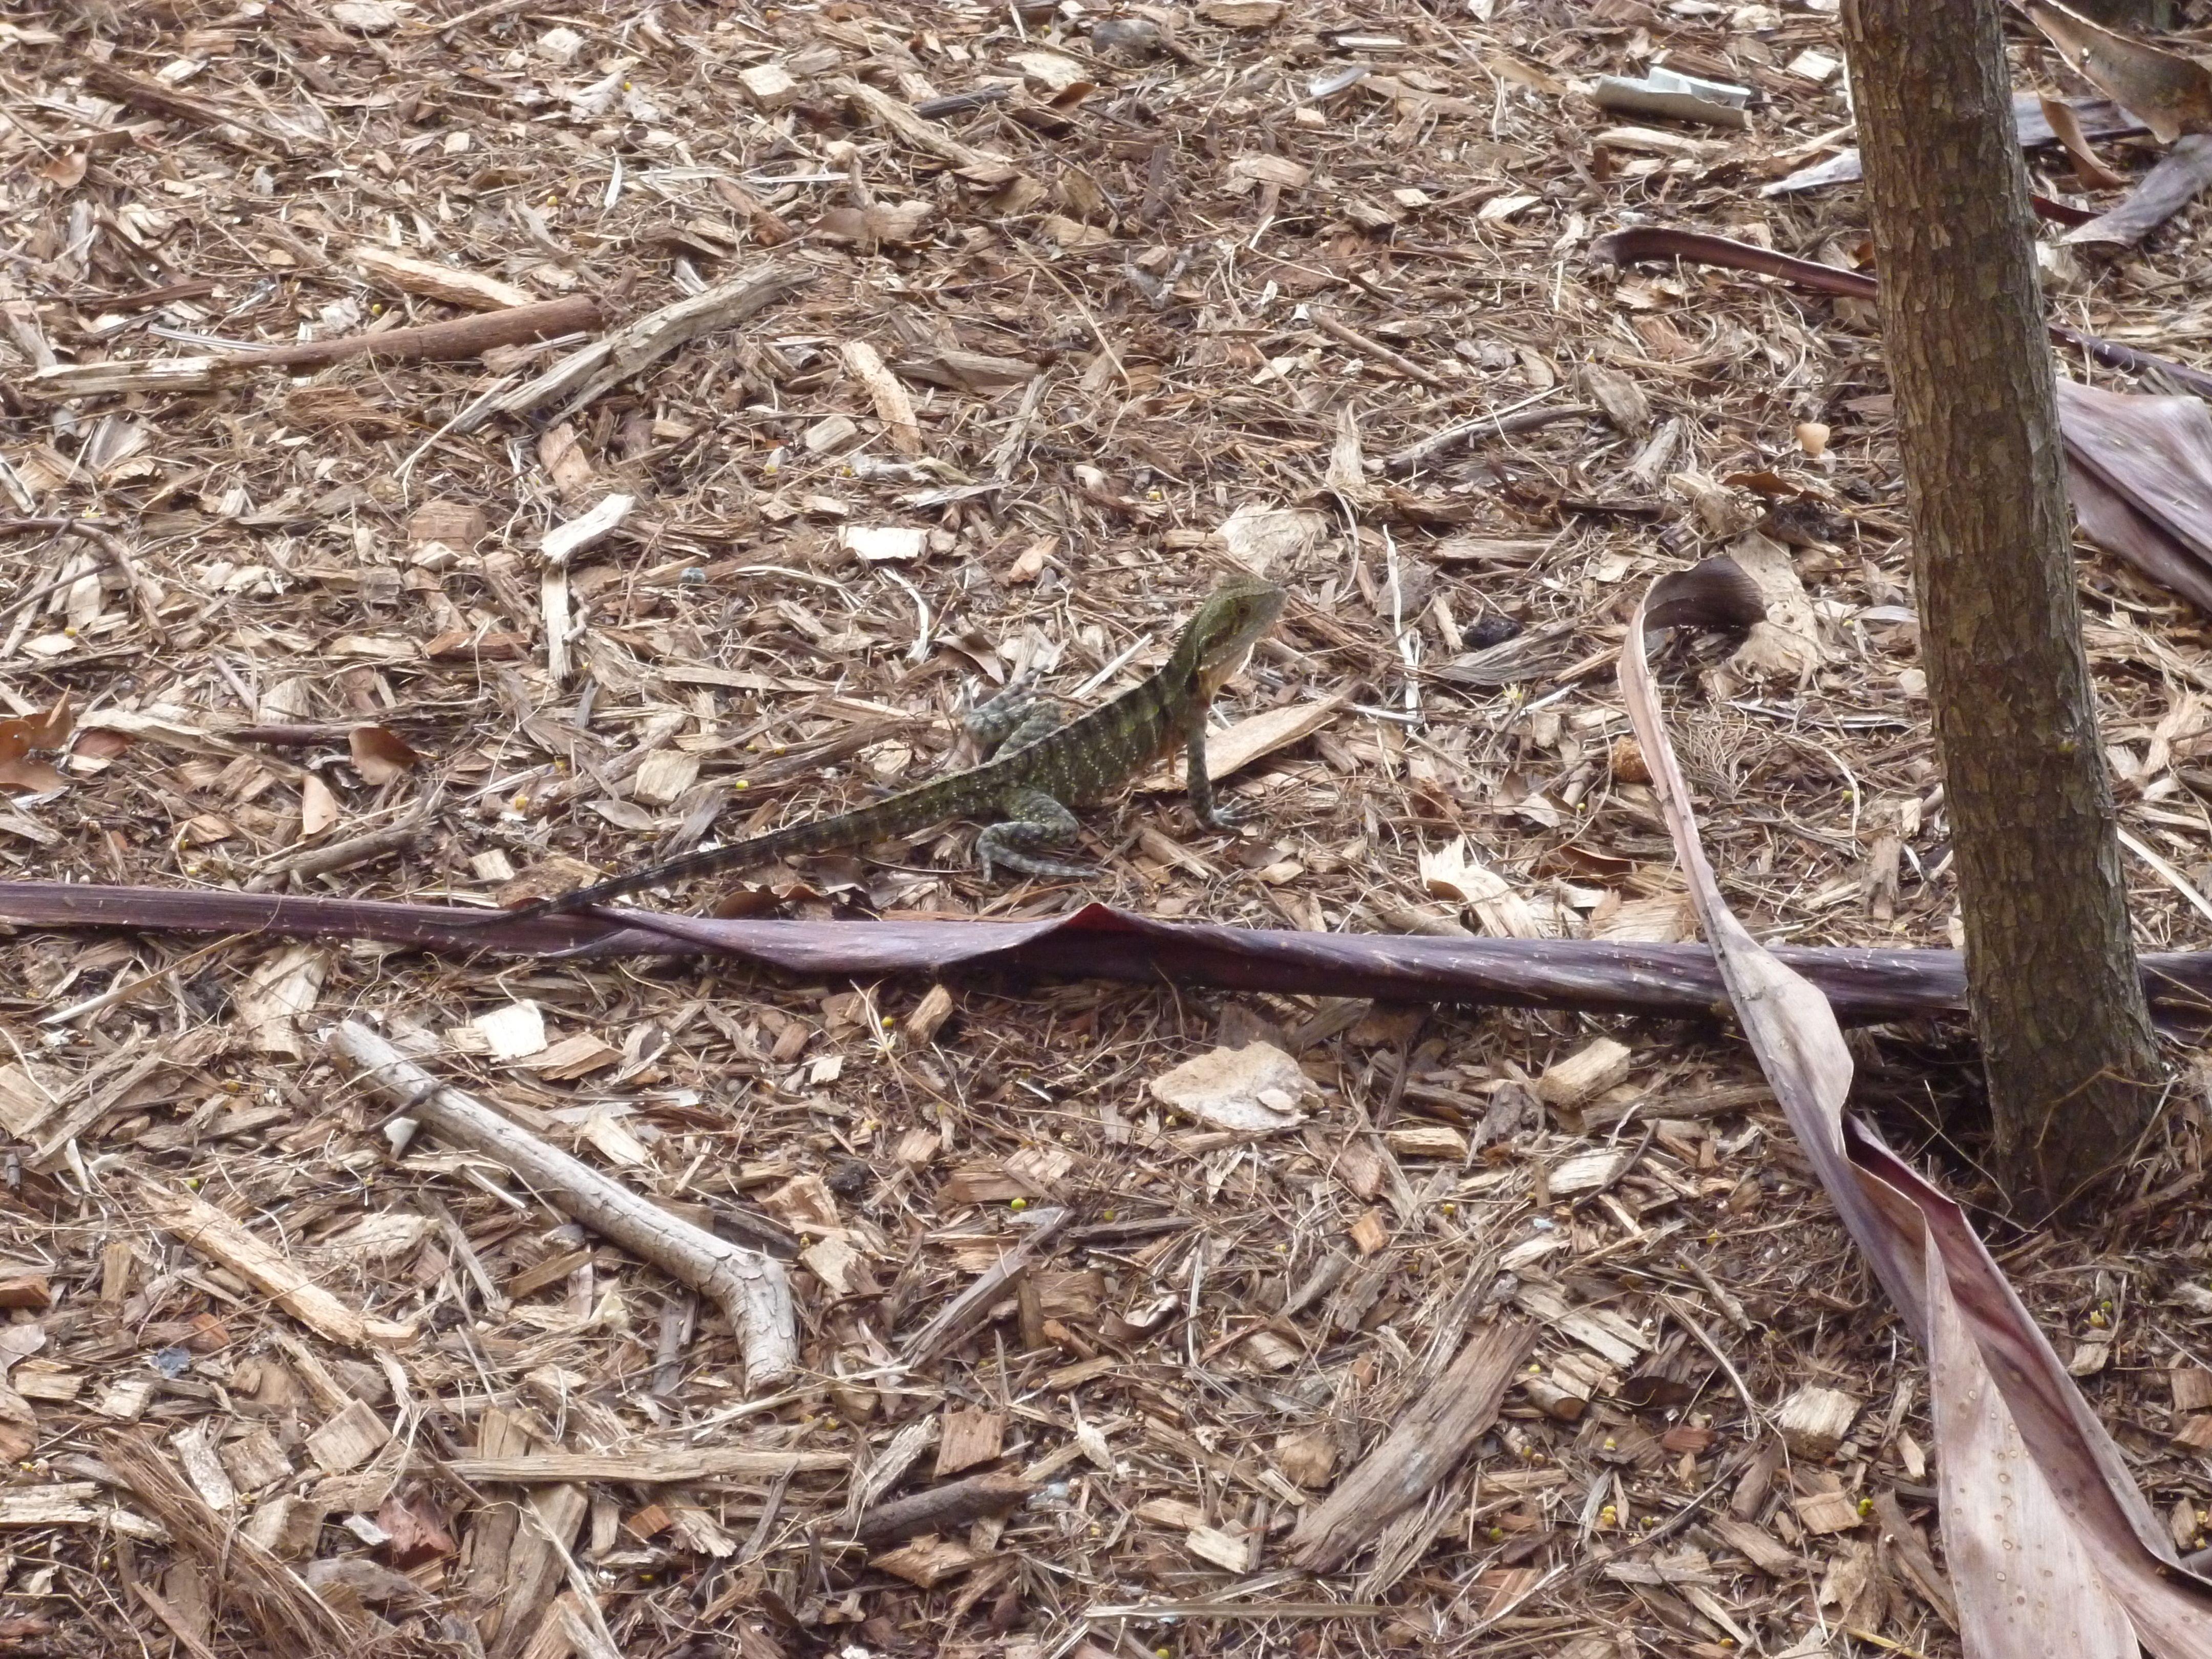 Lizard in Botanical Garden.